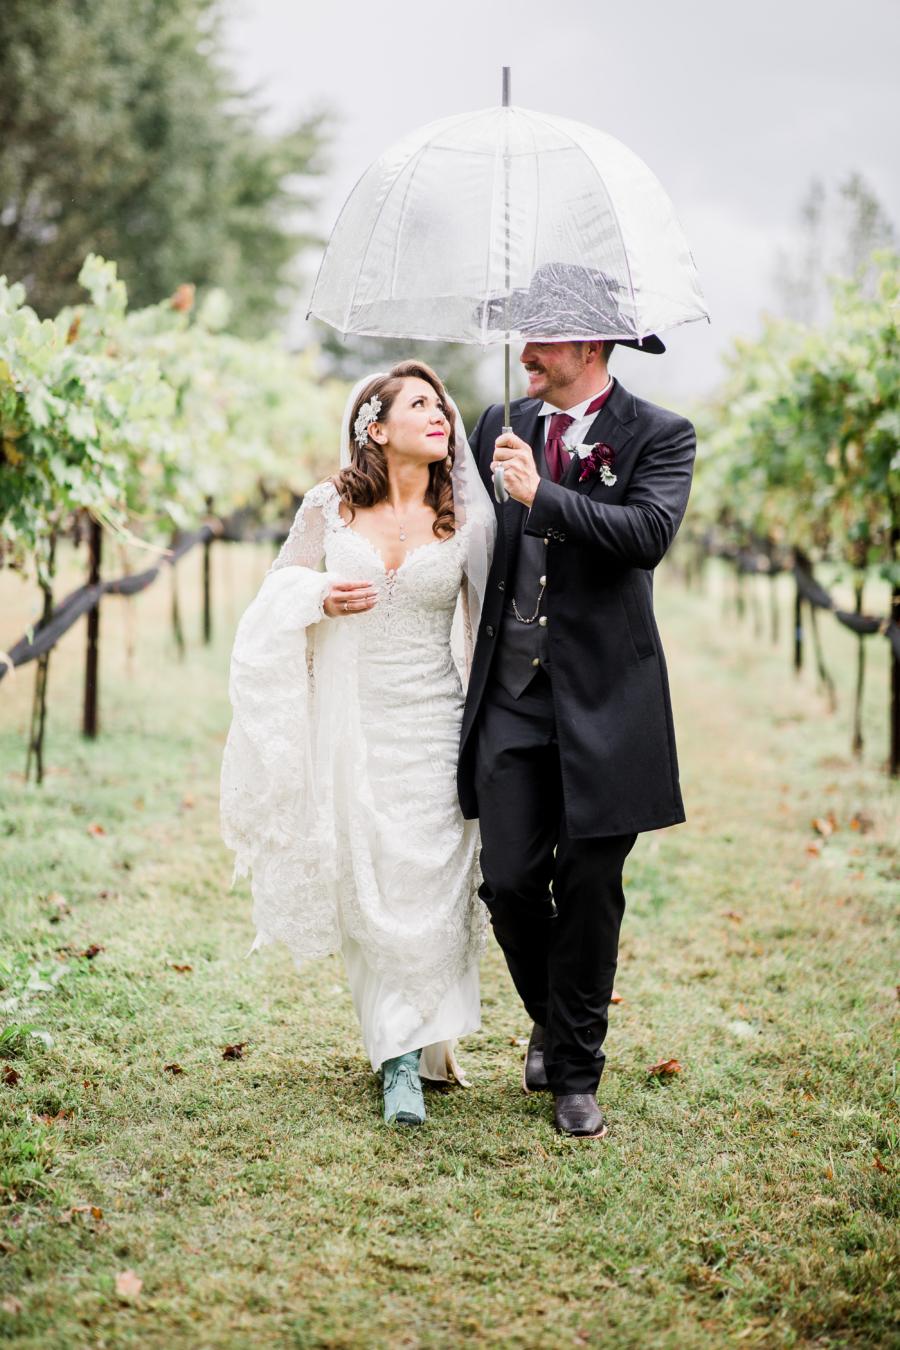 Rainy day wedding ceremony